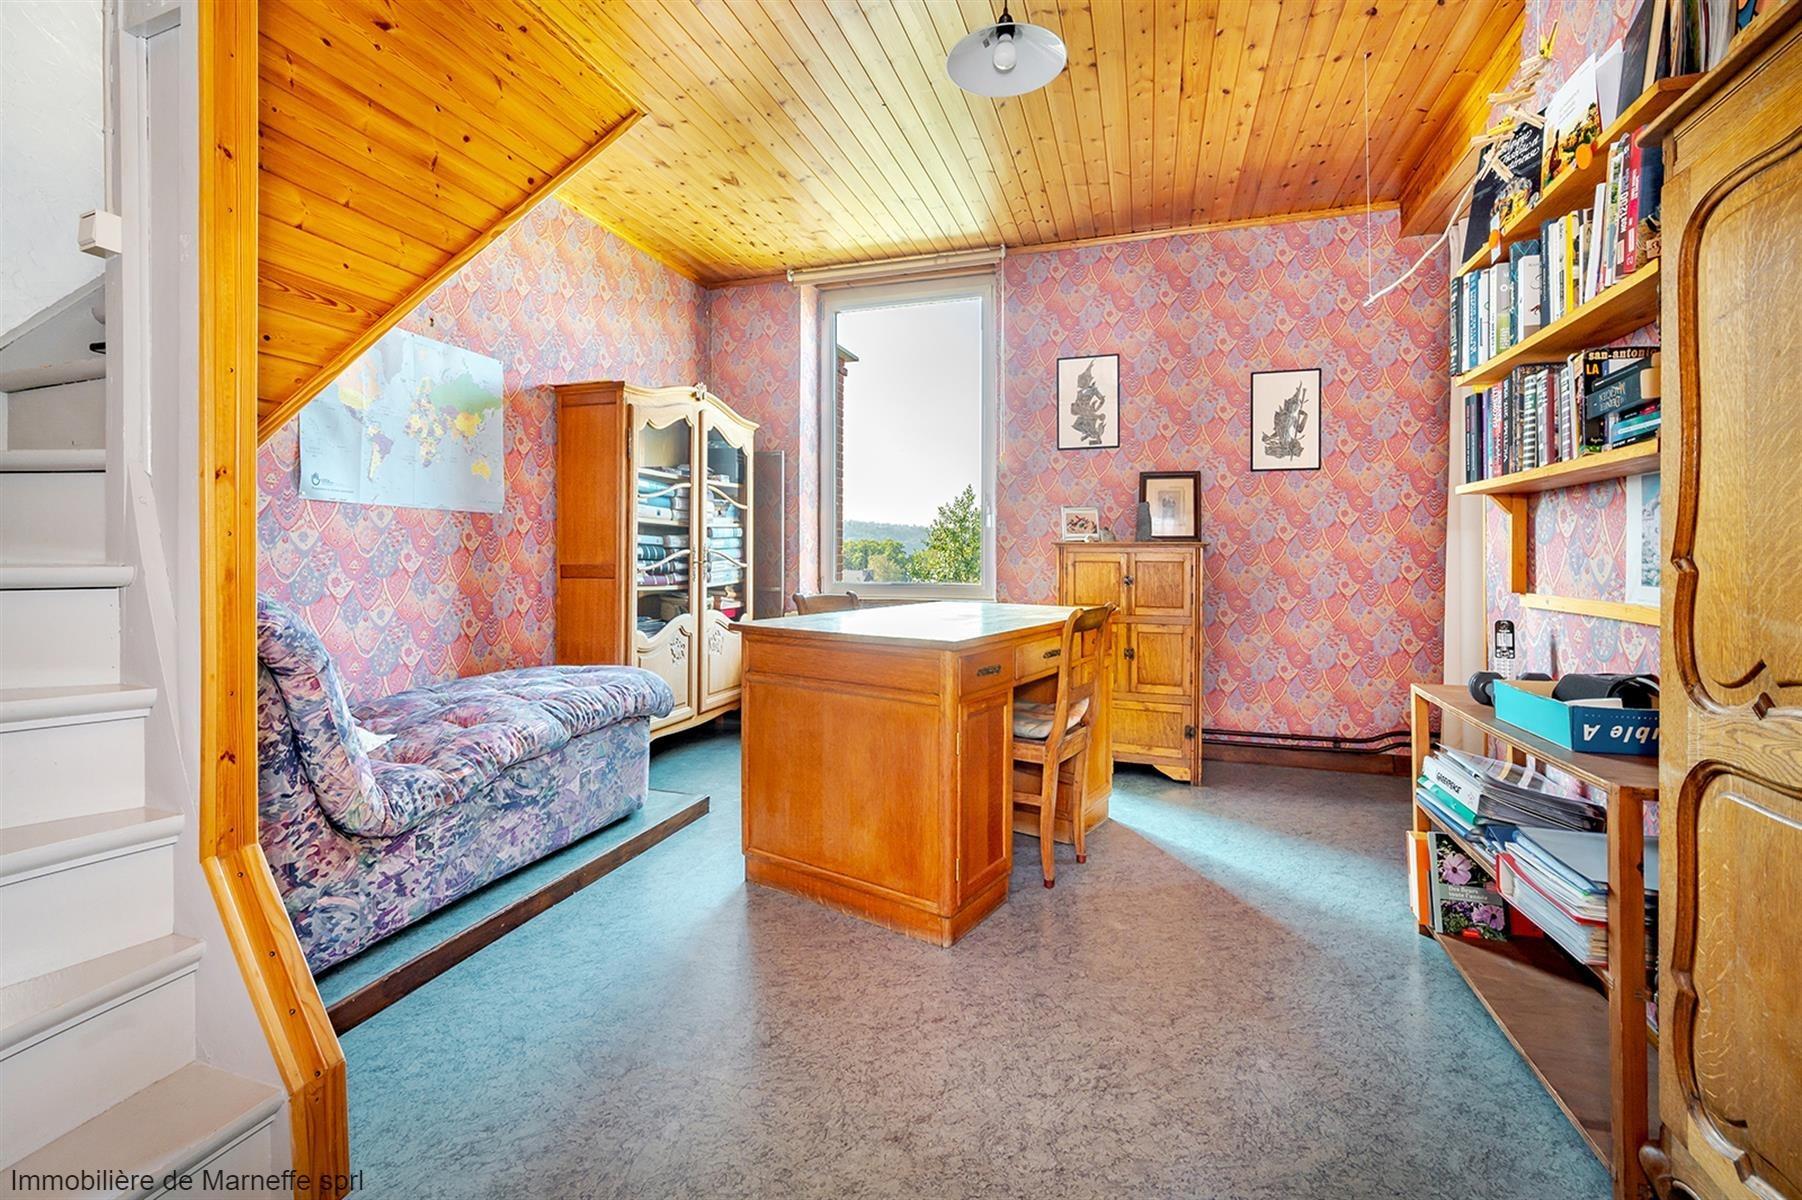 Maison - Liège Chênée - #4529462-14